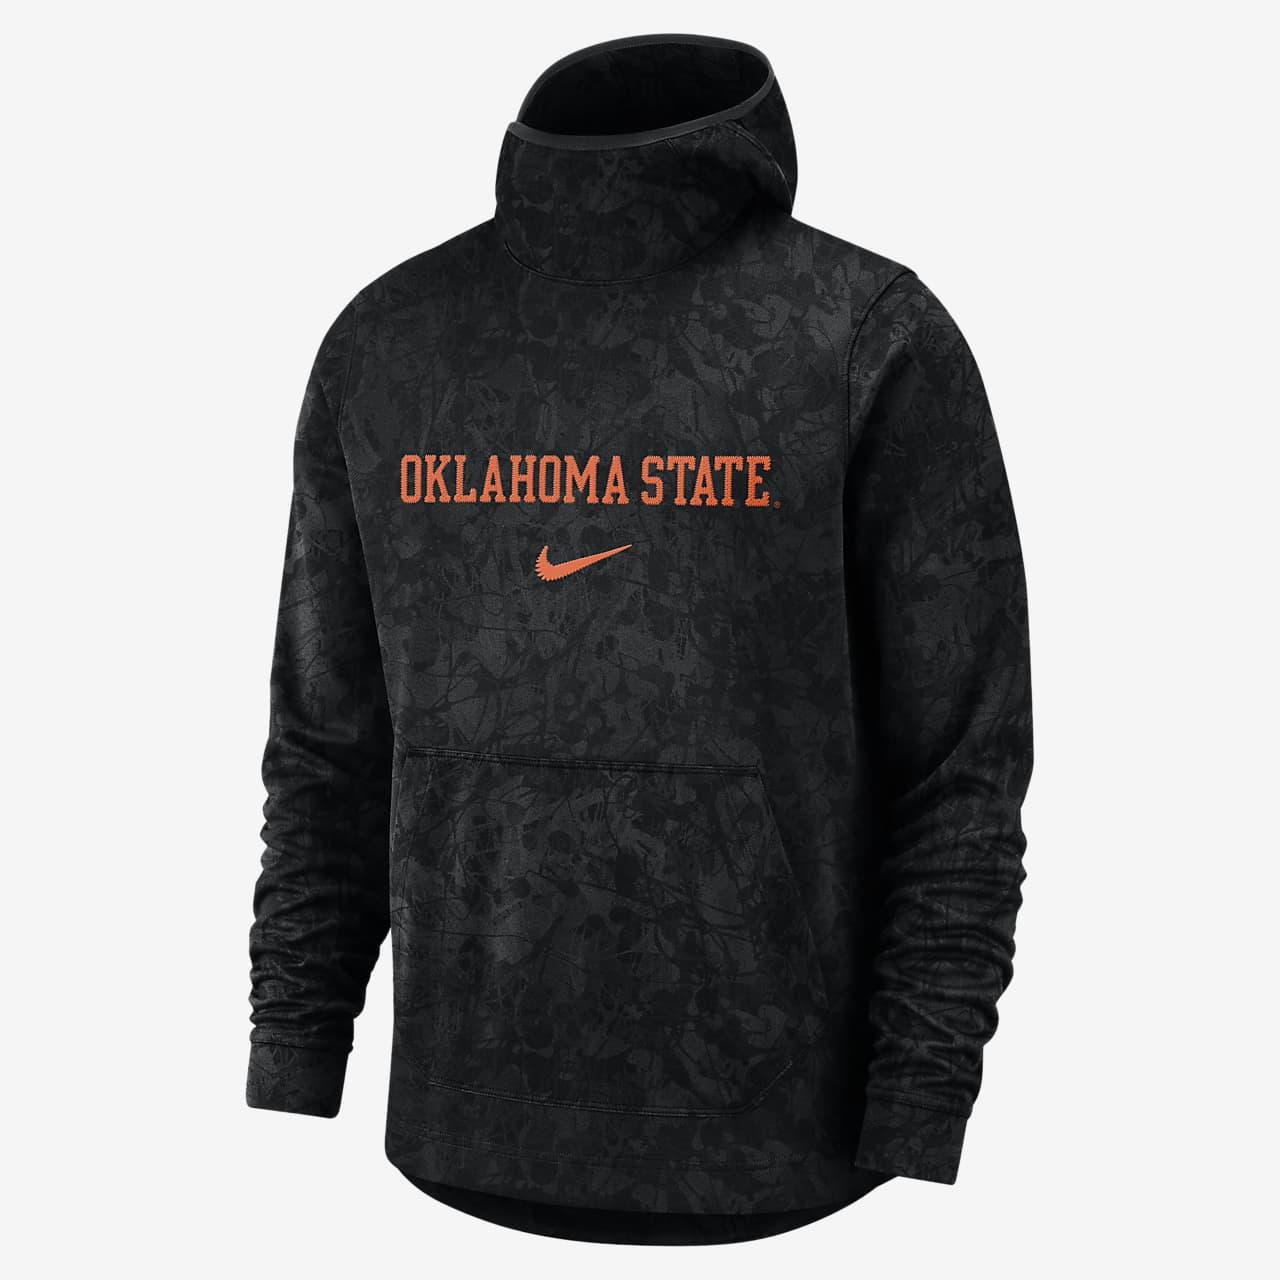 Nike College Dri-FIT Spotlight (Oklahoma State) Men's Pullover Basketball Hoodie